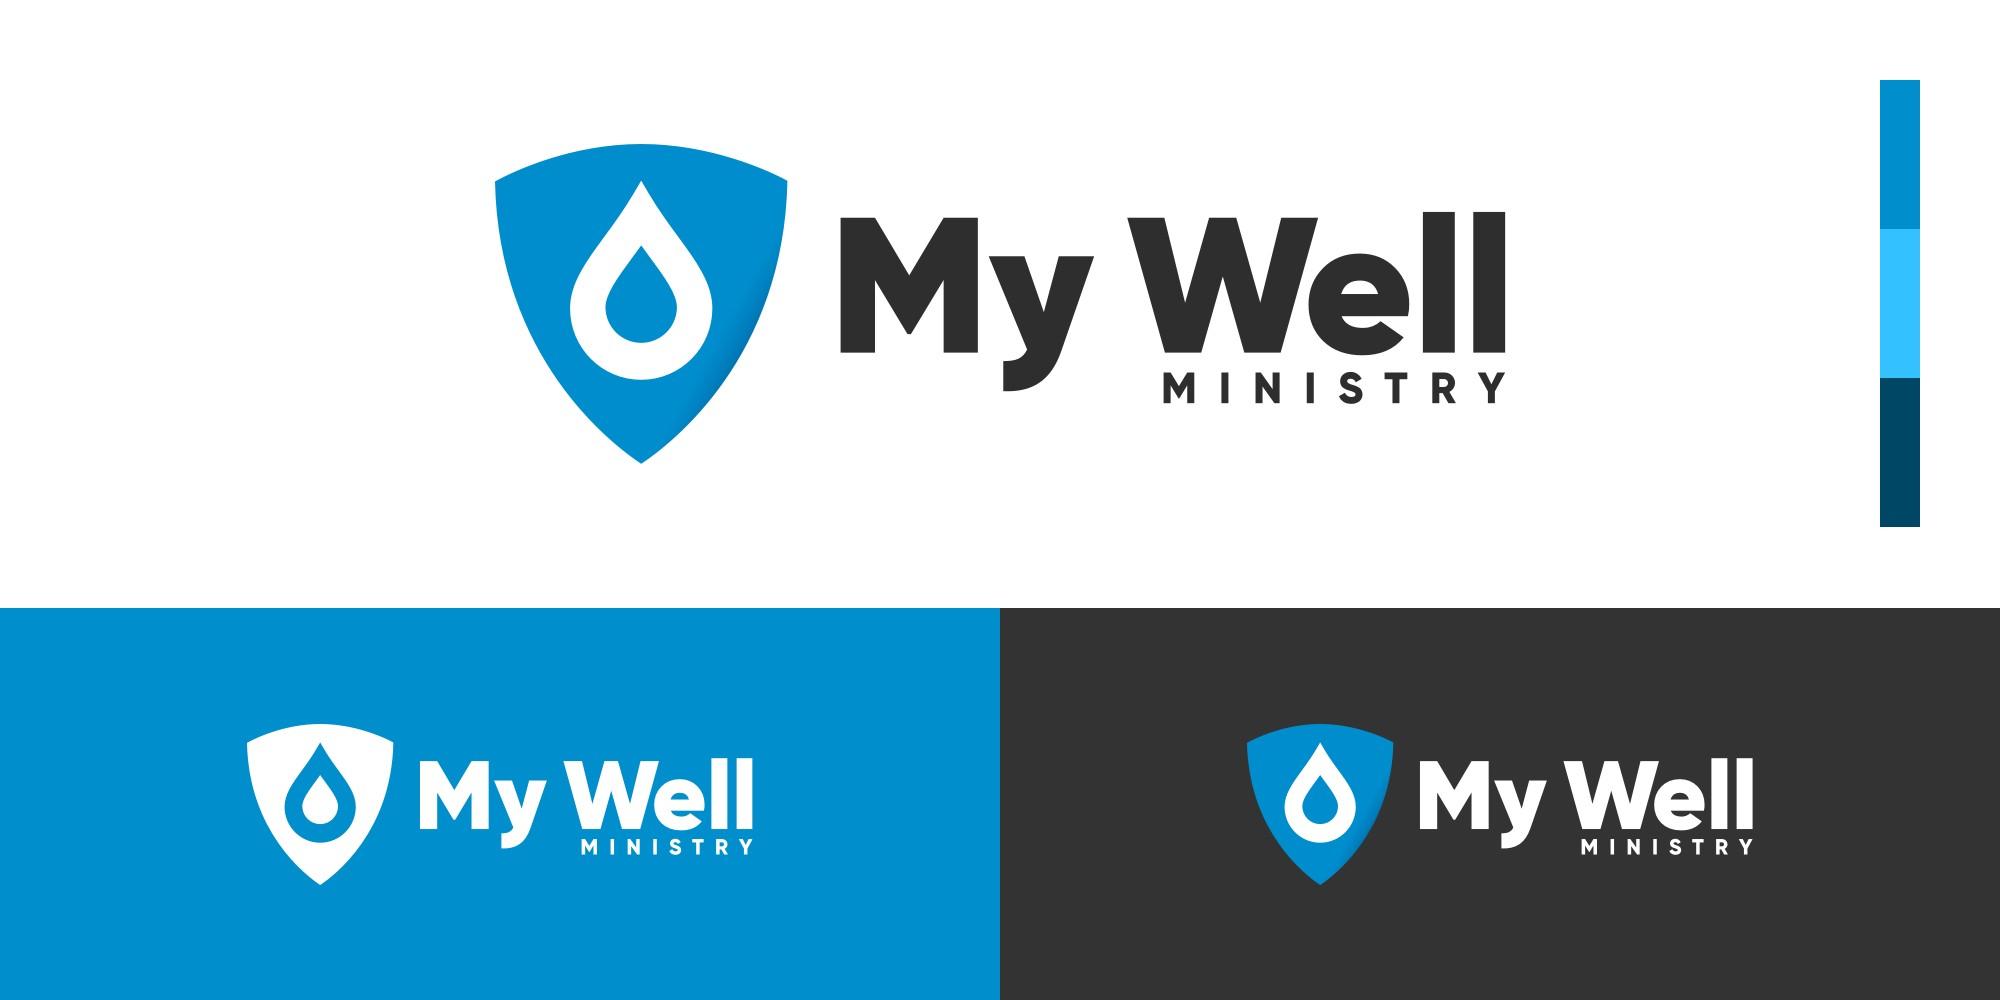 My Well Ministry New Brand & Logo Lockup